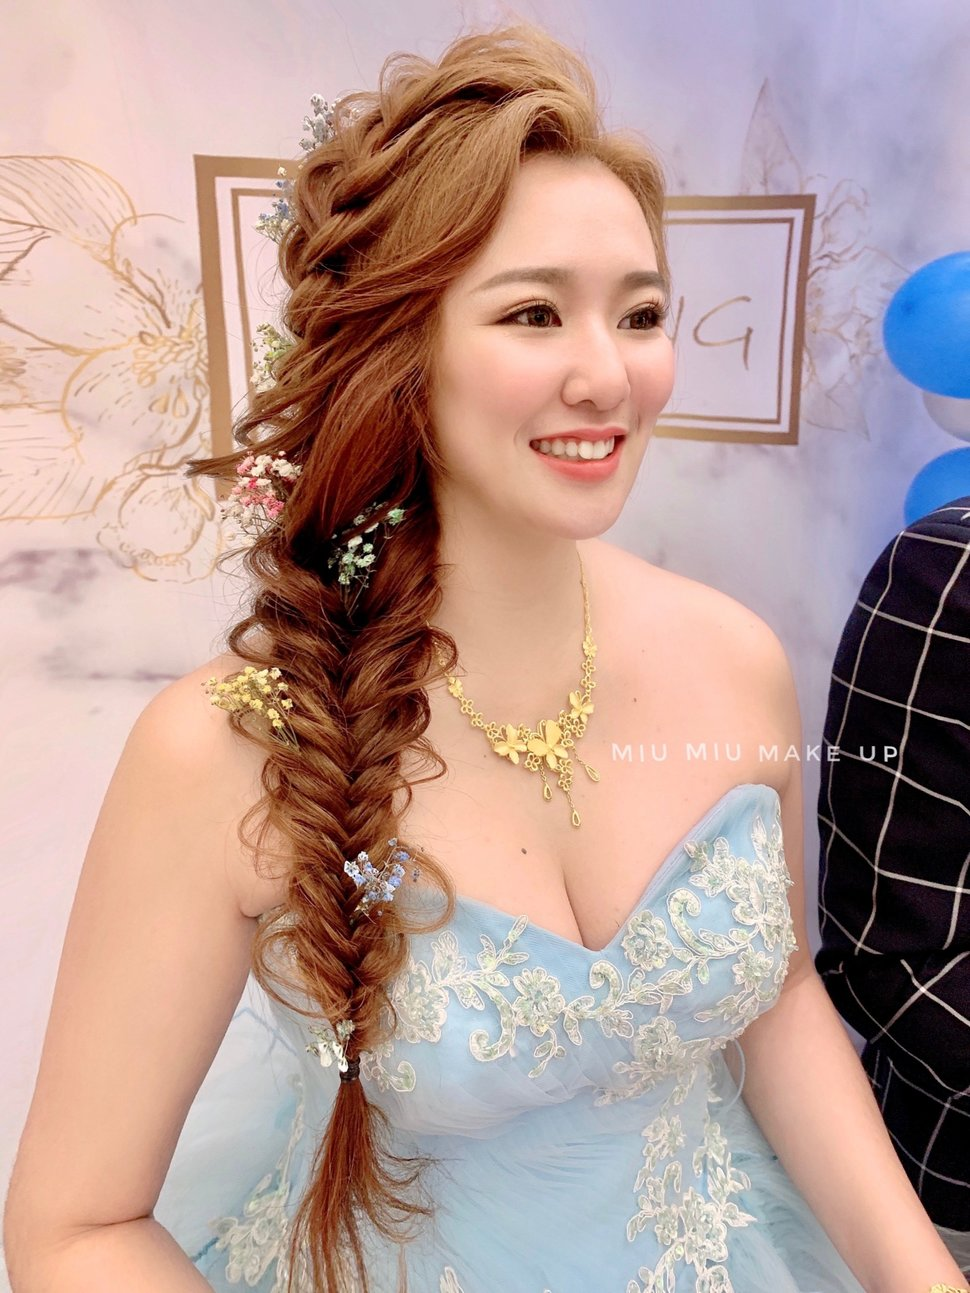 915B5C15-B831-495B-9EF7-17C8EEA0749D - Miu Miu Wang《結婚吧》